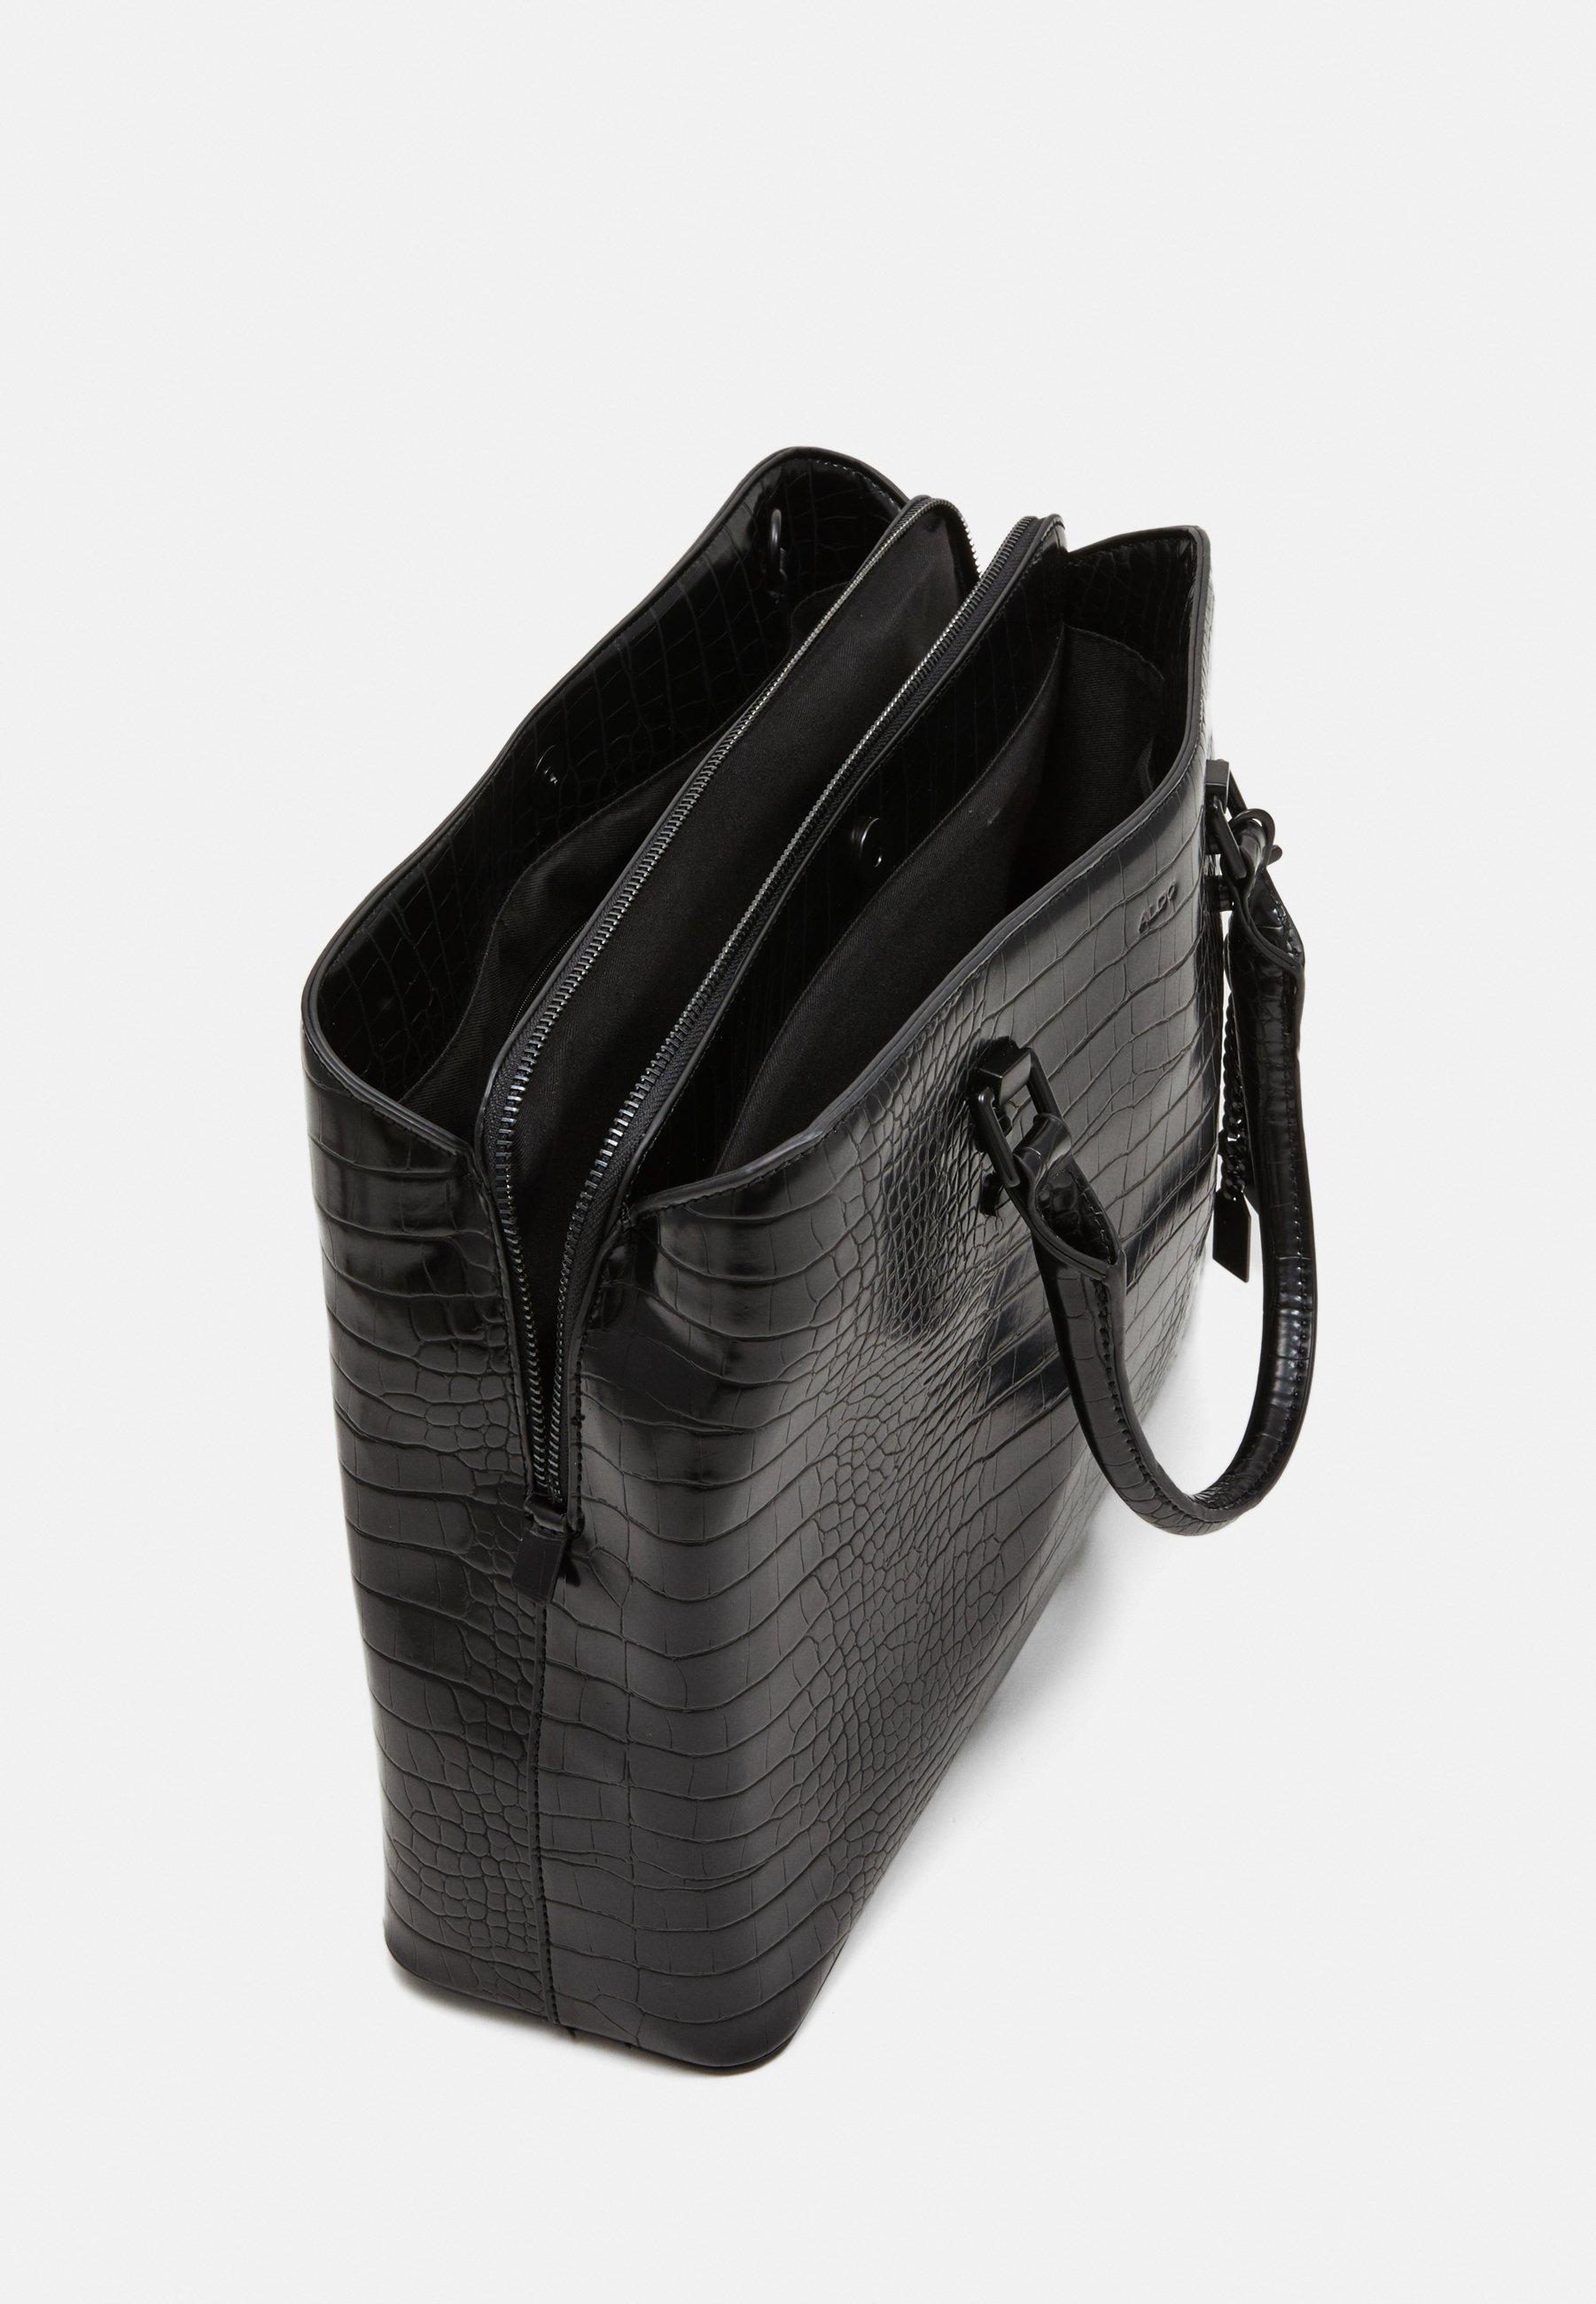 ALDO SIGOSSA - Shoppingveske - other black/svart dGwl5mNZ0r8sa11